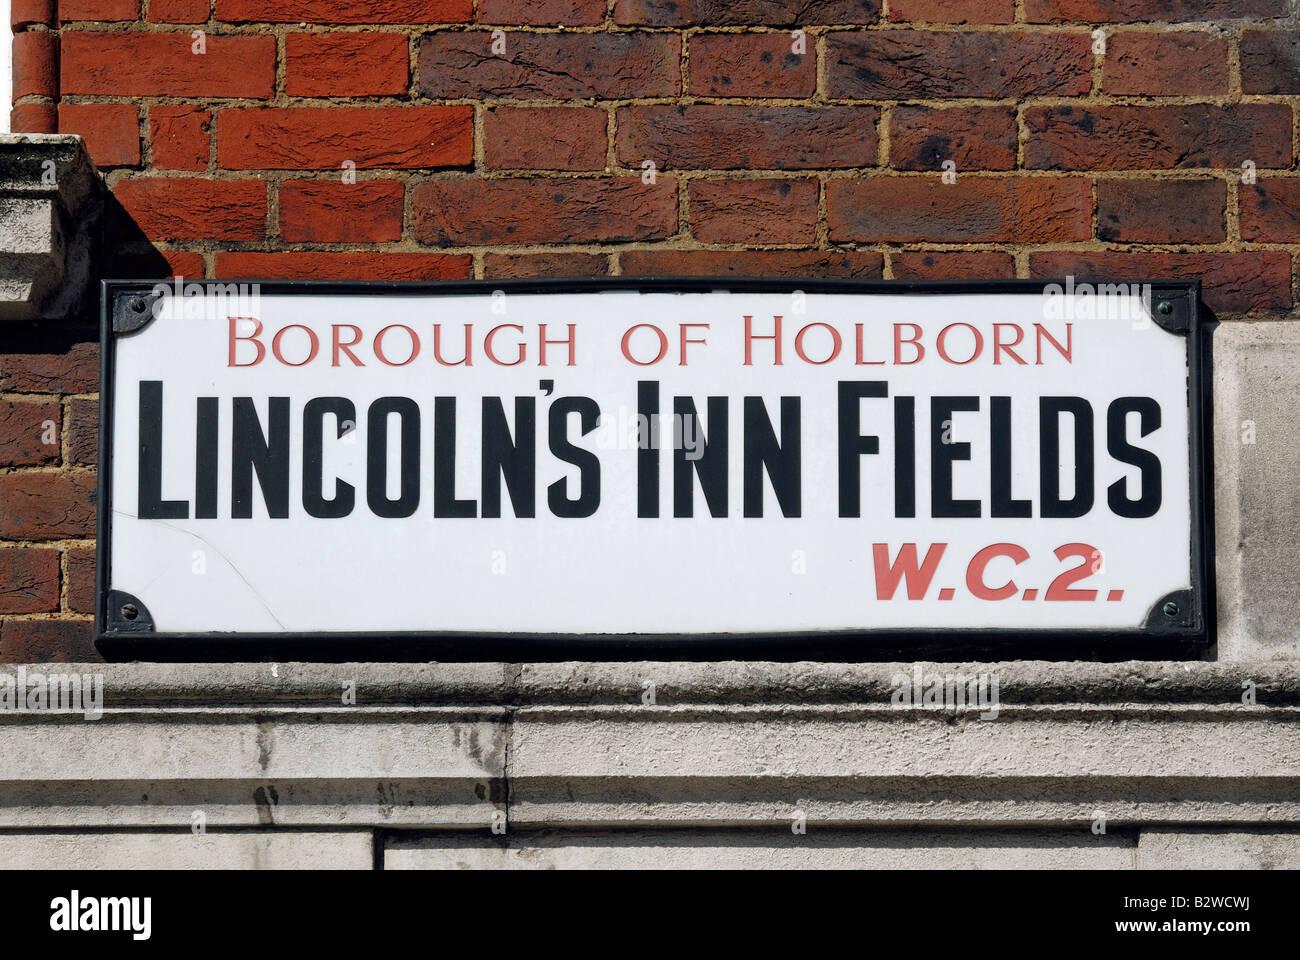 Lincoln's Inn Fields road sign - Stock Image